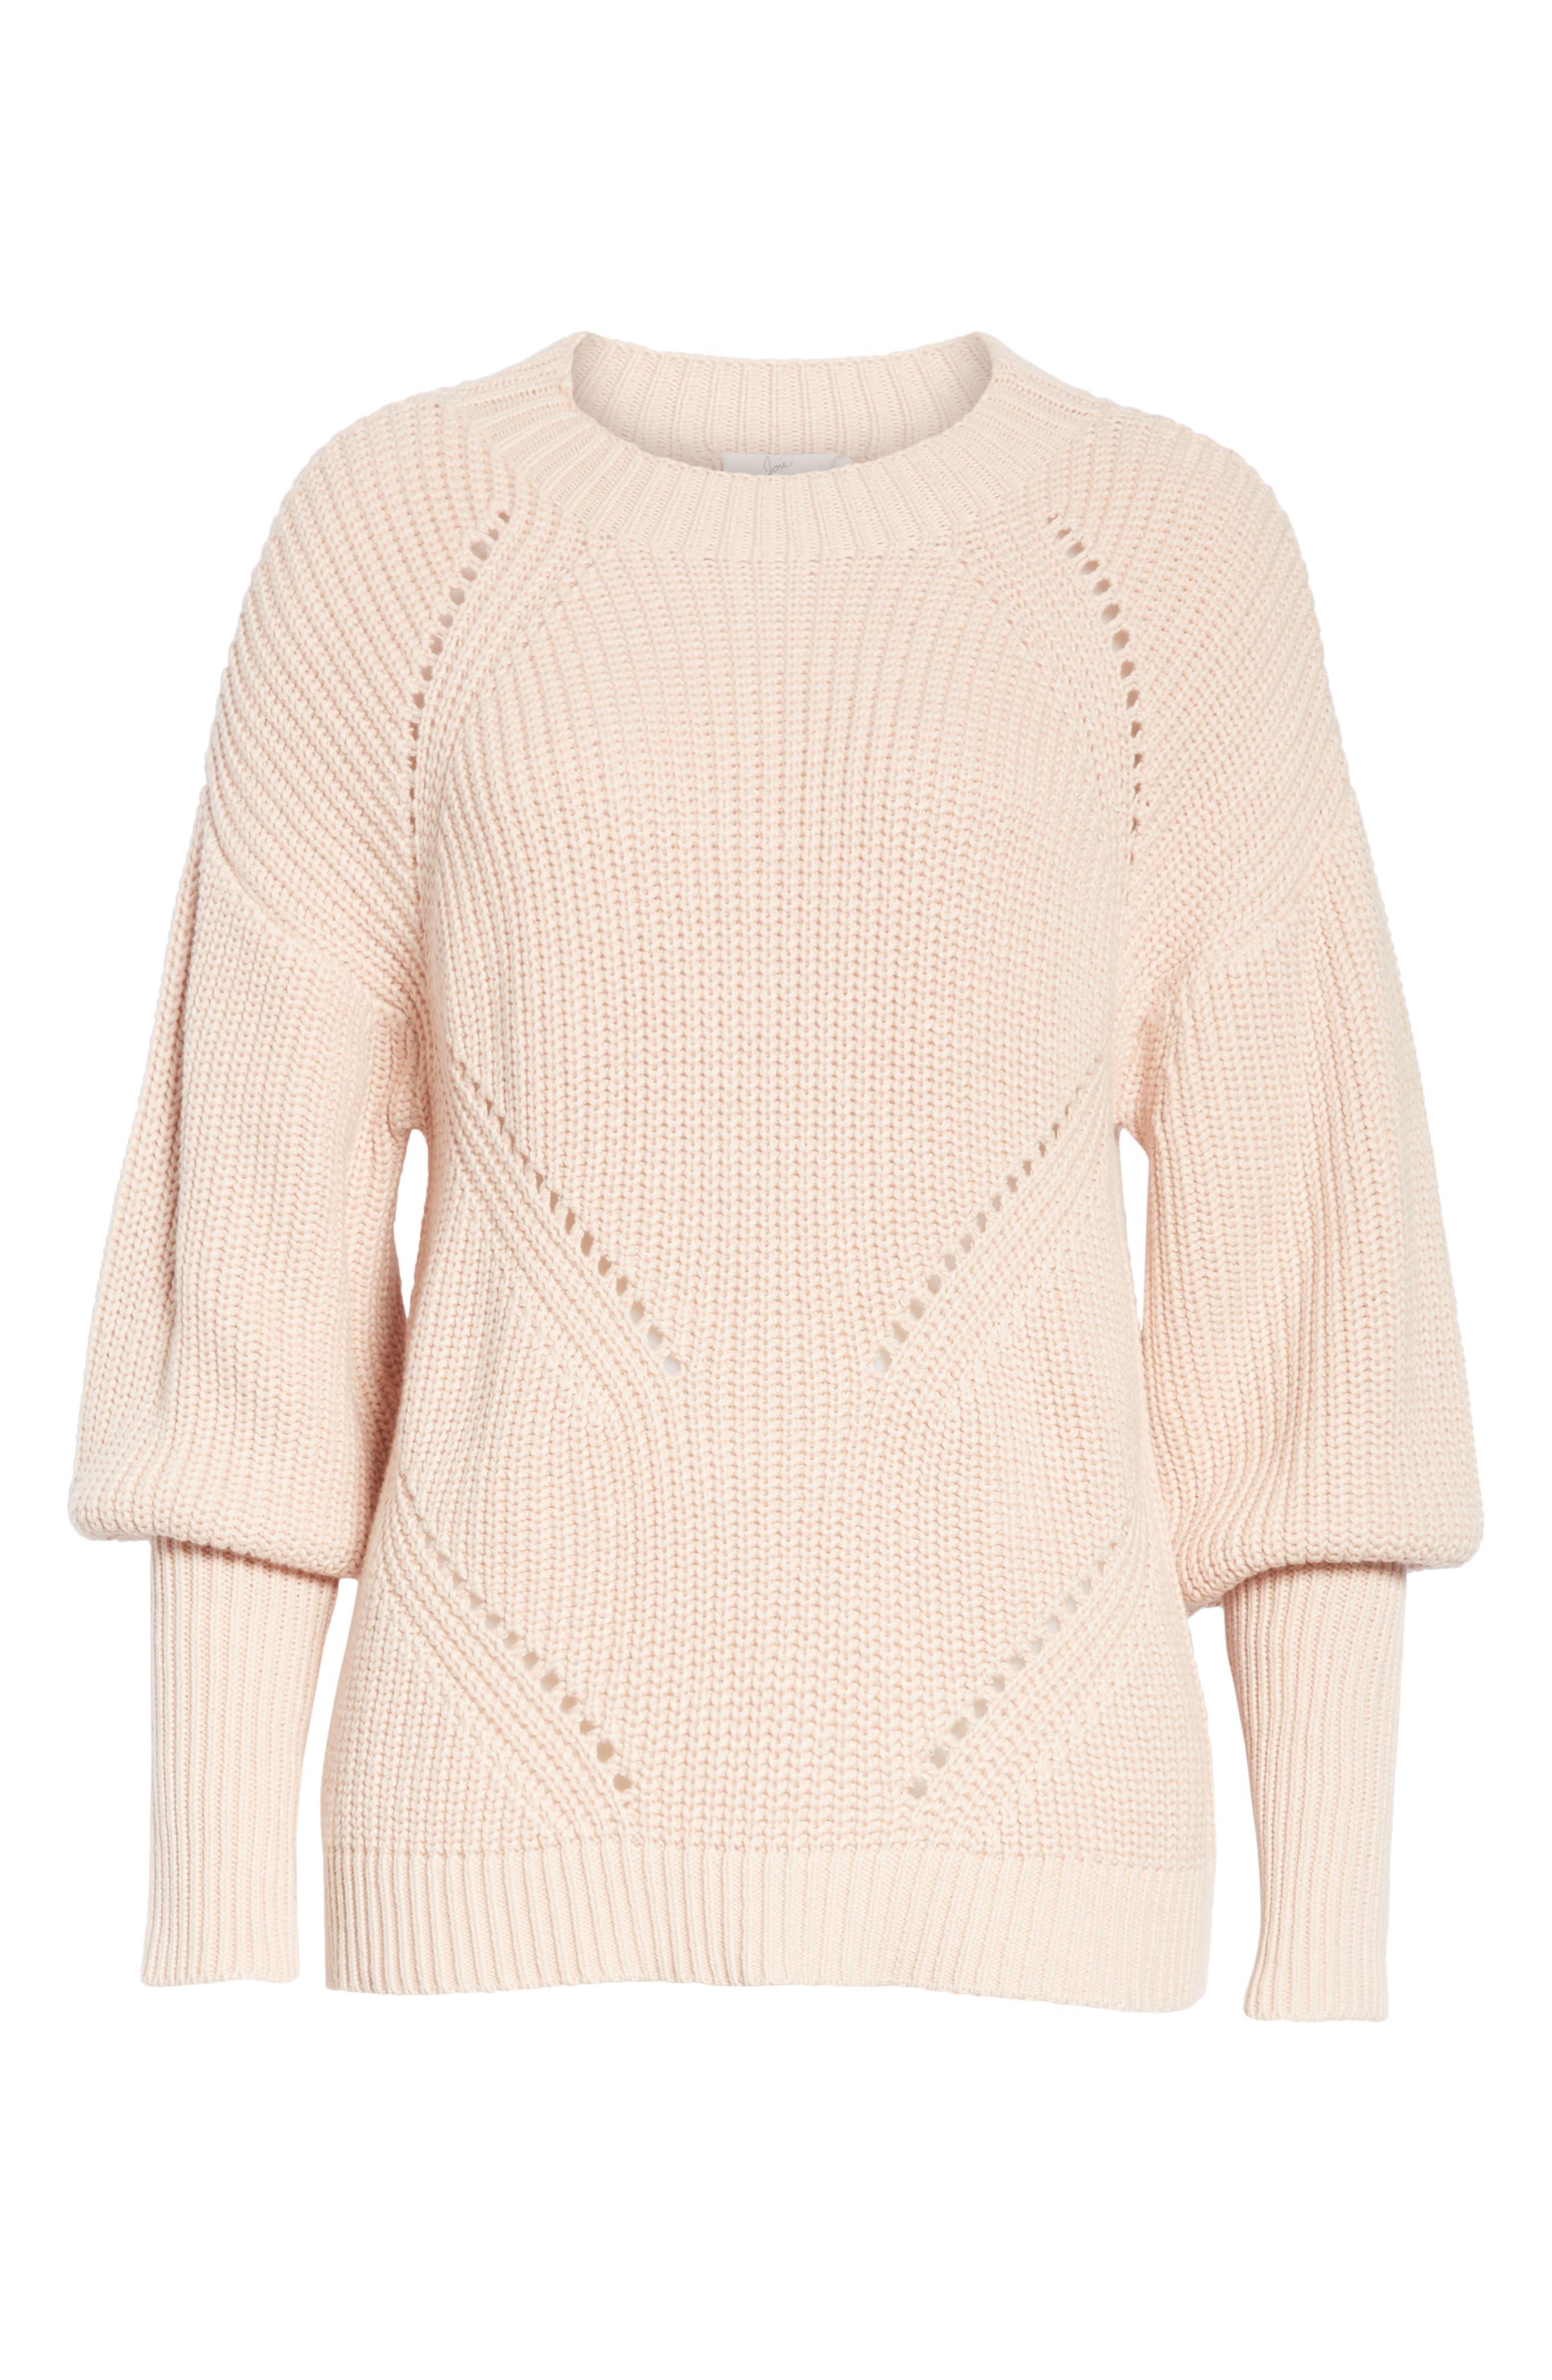 Landyn Blouson Sleeve Sweater,                             Alternate thumbnail 6, color,                             PINK SKY